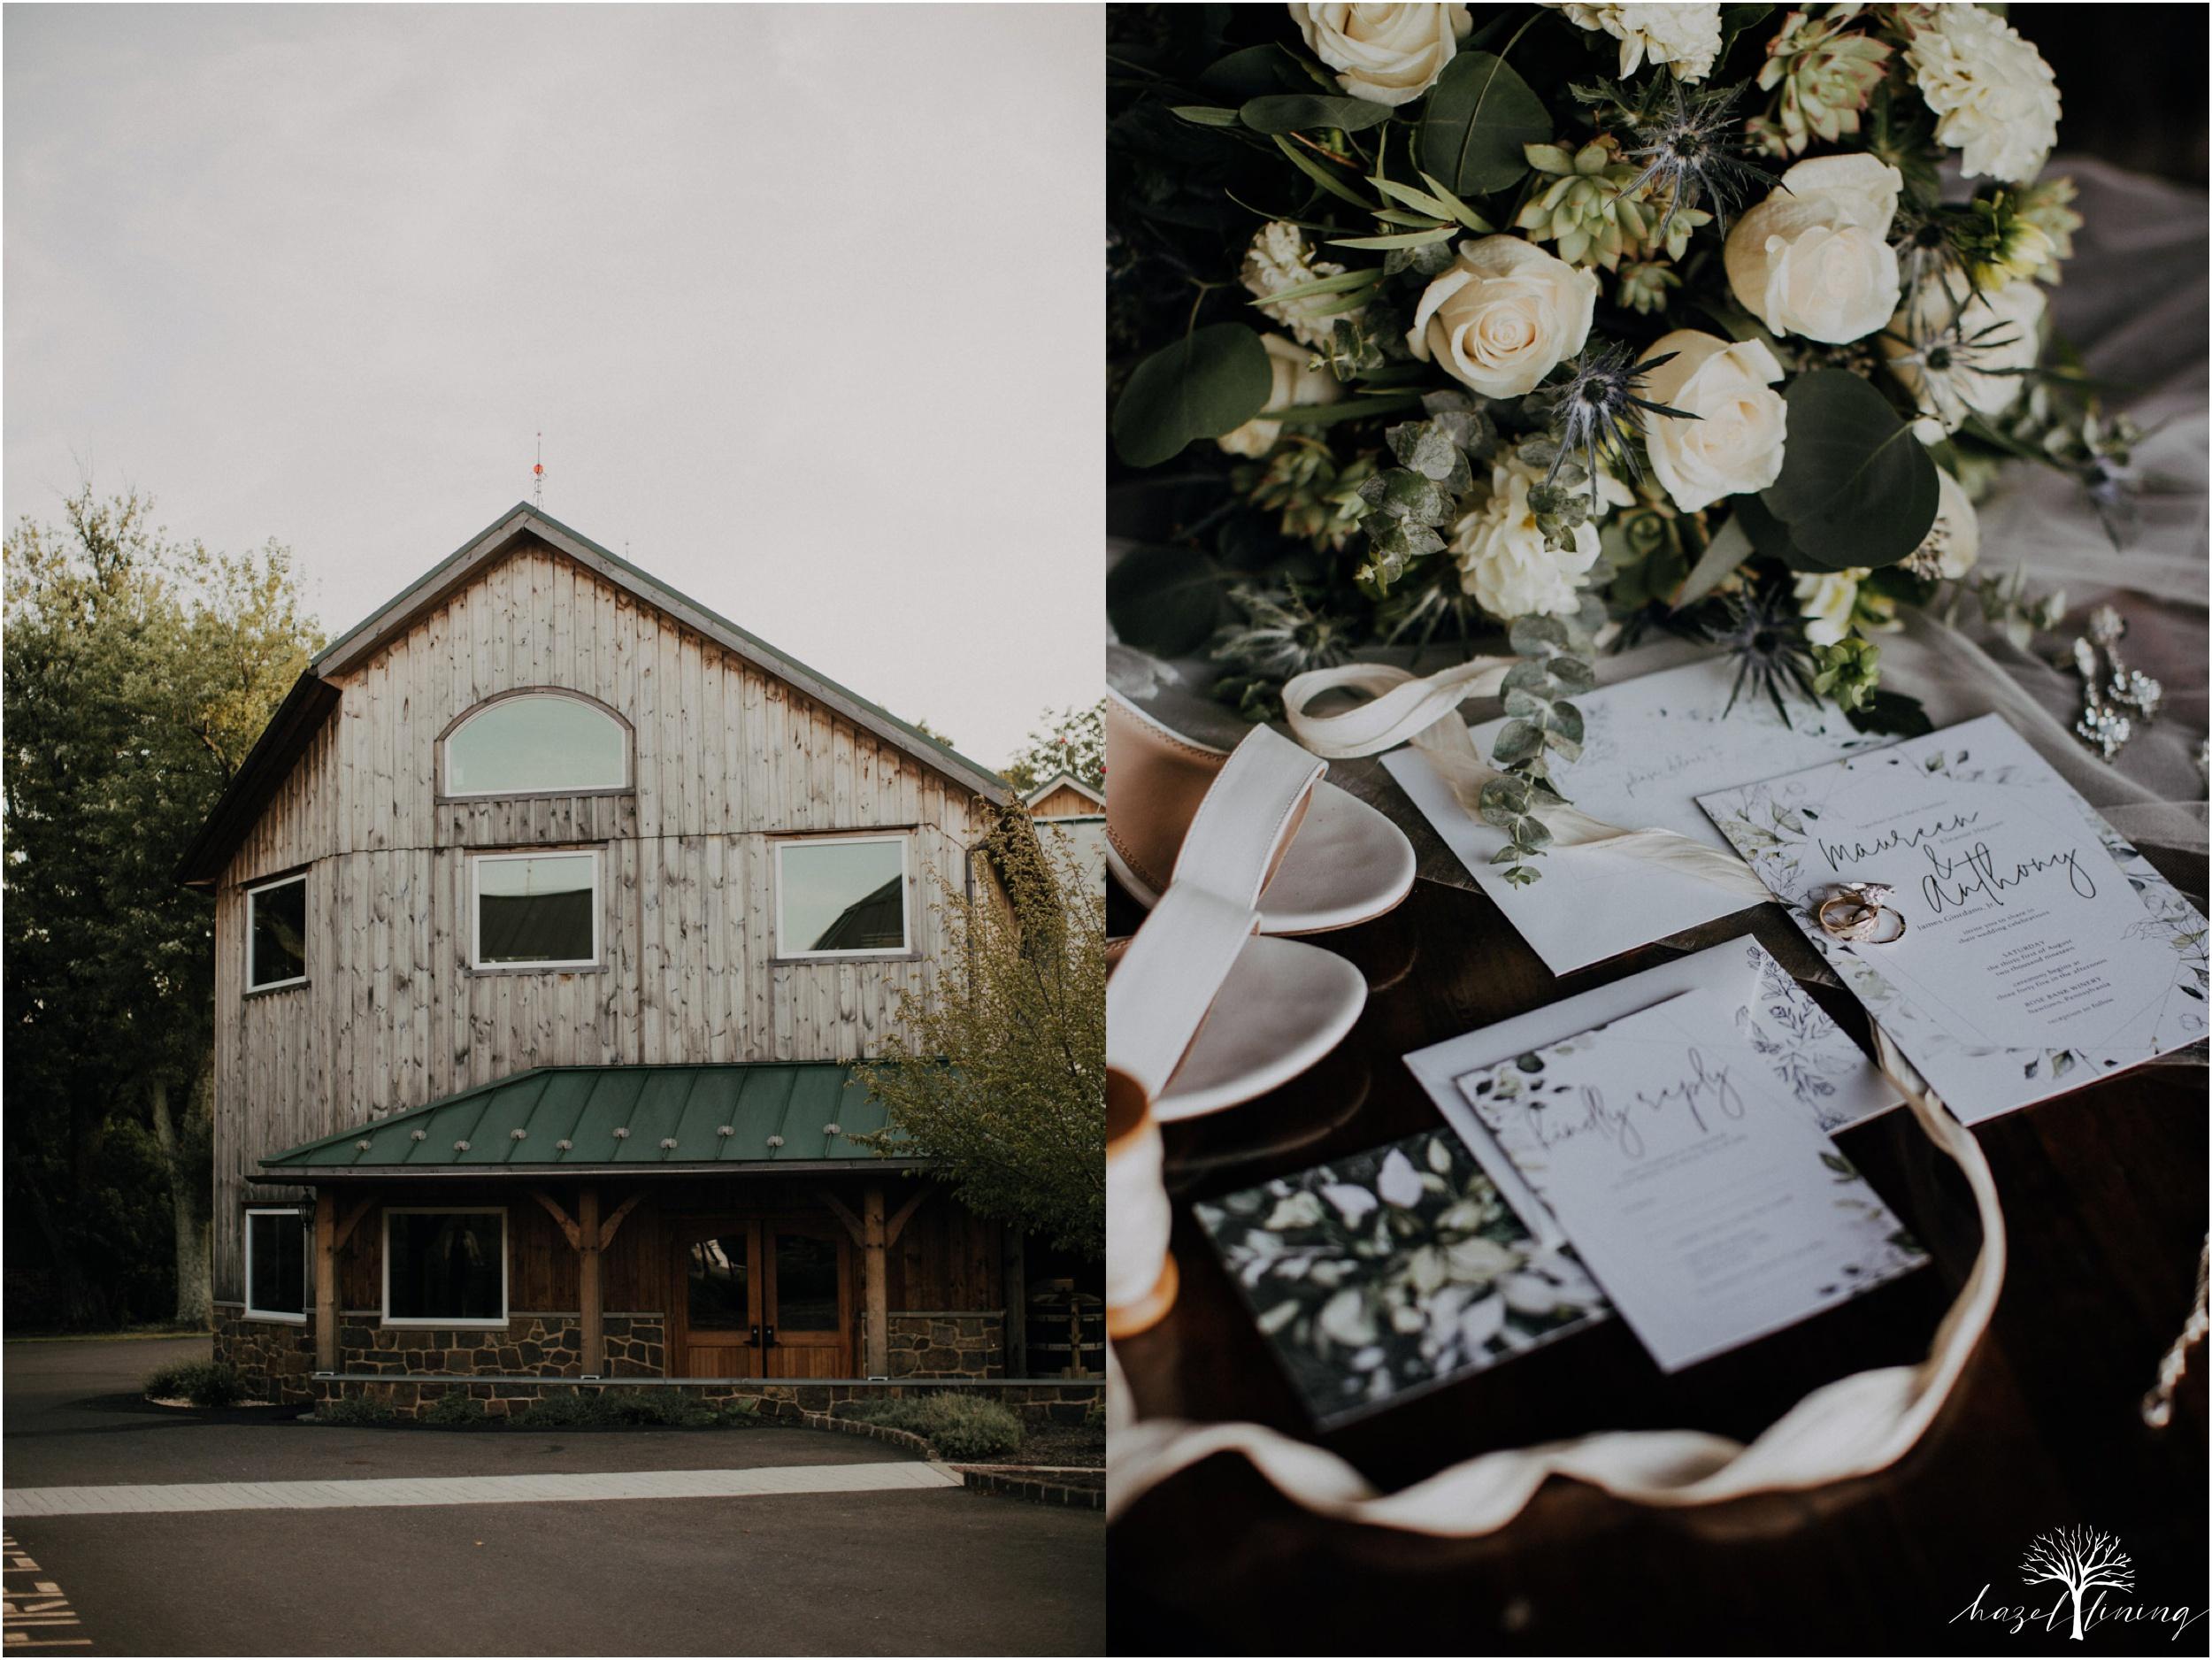 maureen-hepner-anthony-giordano-rose-bank-winery-newtow-pennsylvania-luxury-summer-wedding-hazel-lining-photography-destination-elopement-wedding-engagement-photography_0005.jpg